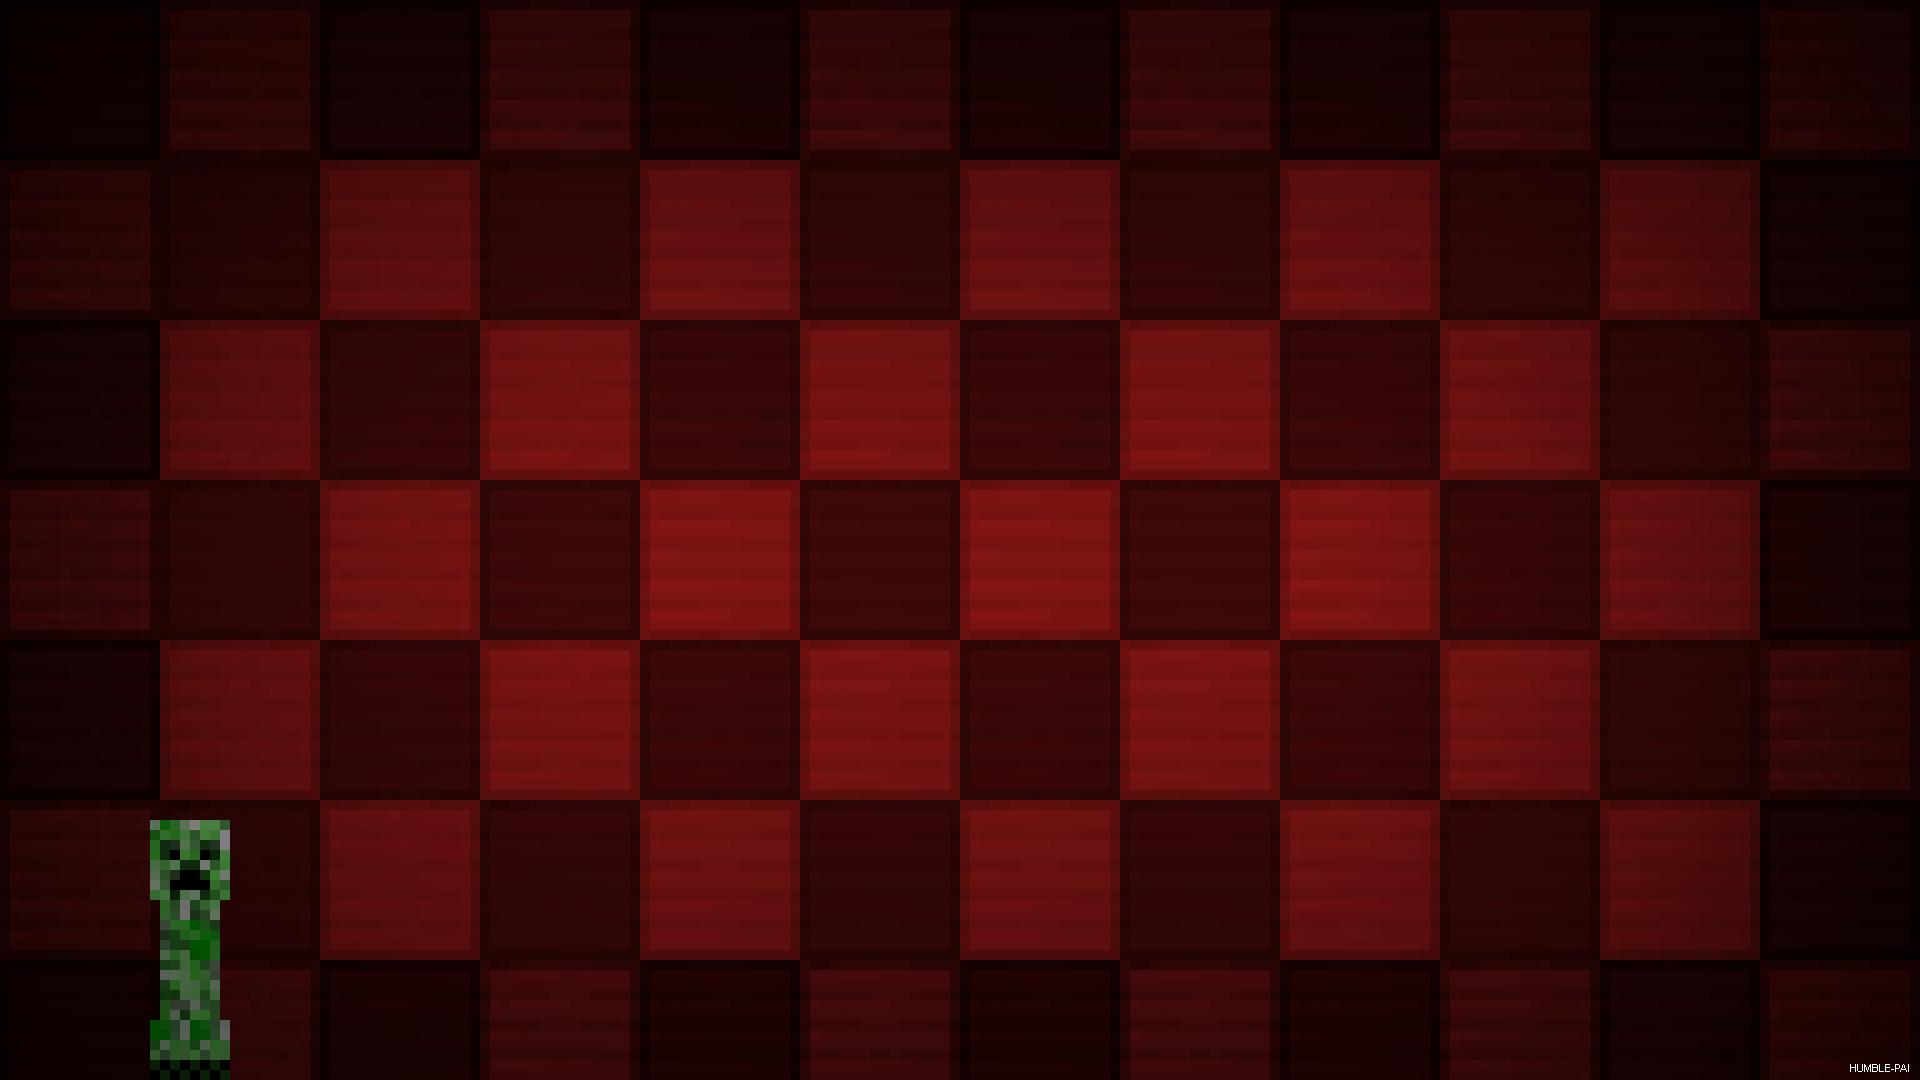 minecraft_wallpaper__creeper_buddy_by_humble_pai-d4pfp5l